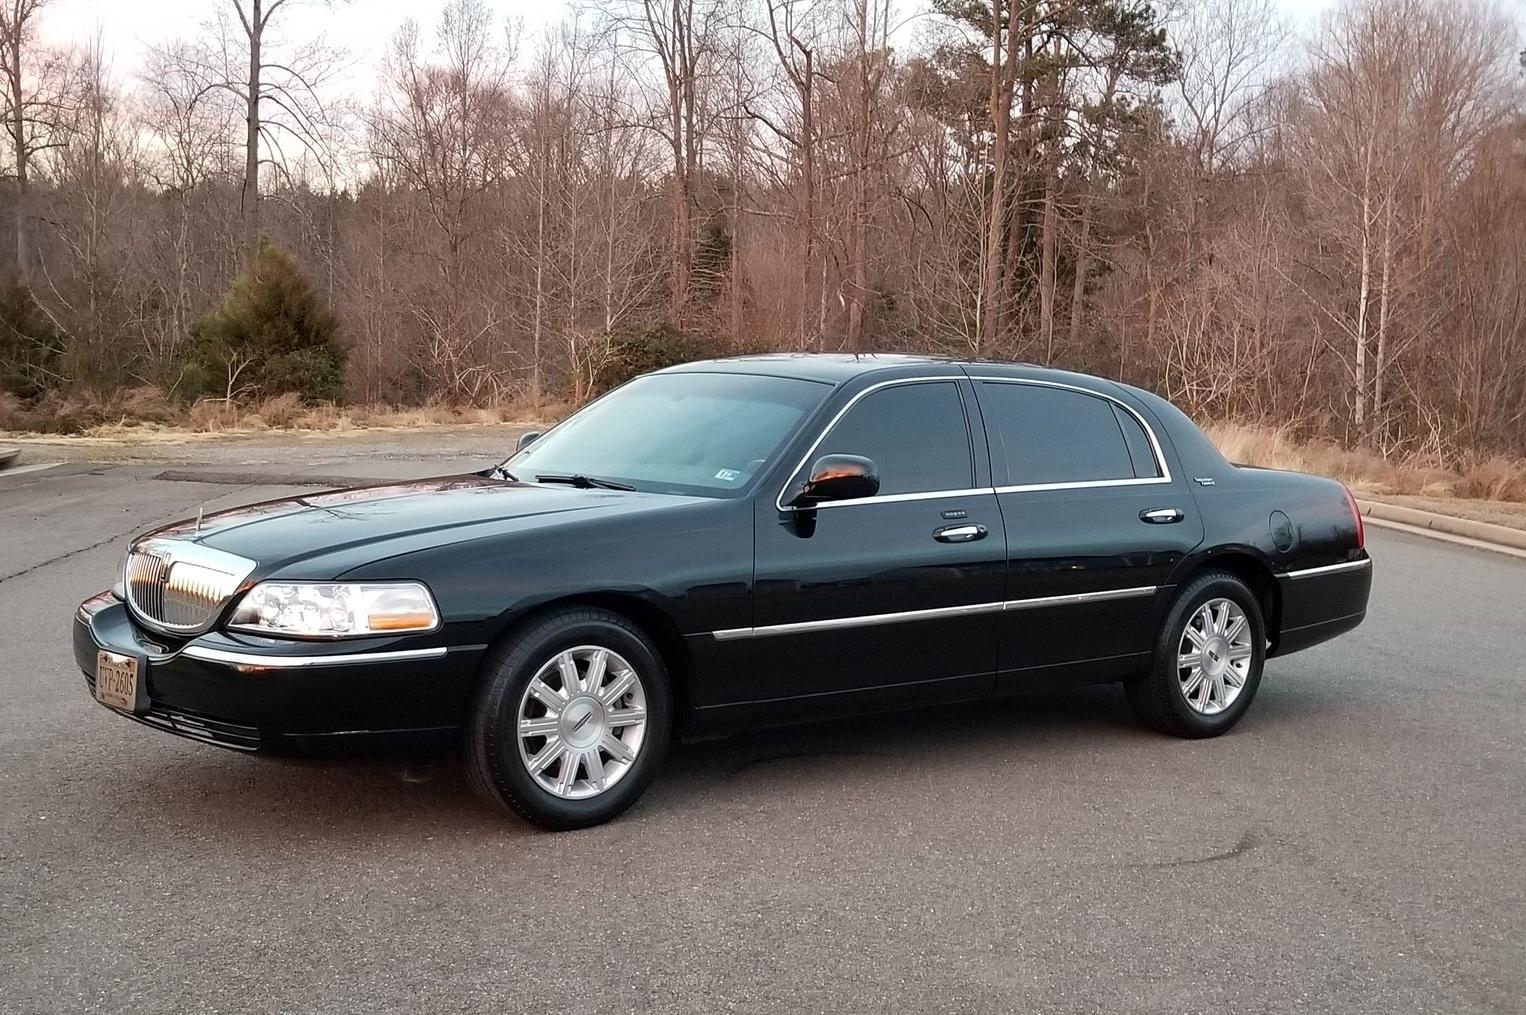 Lincoln Town Car Sedan Seating for 2 Passengers.